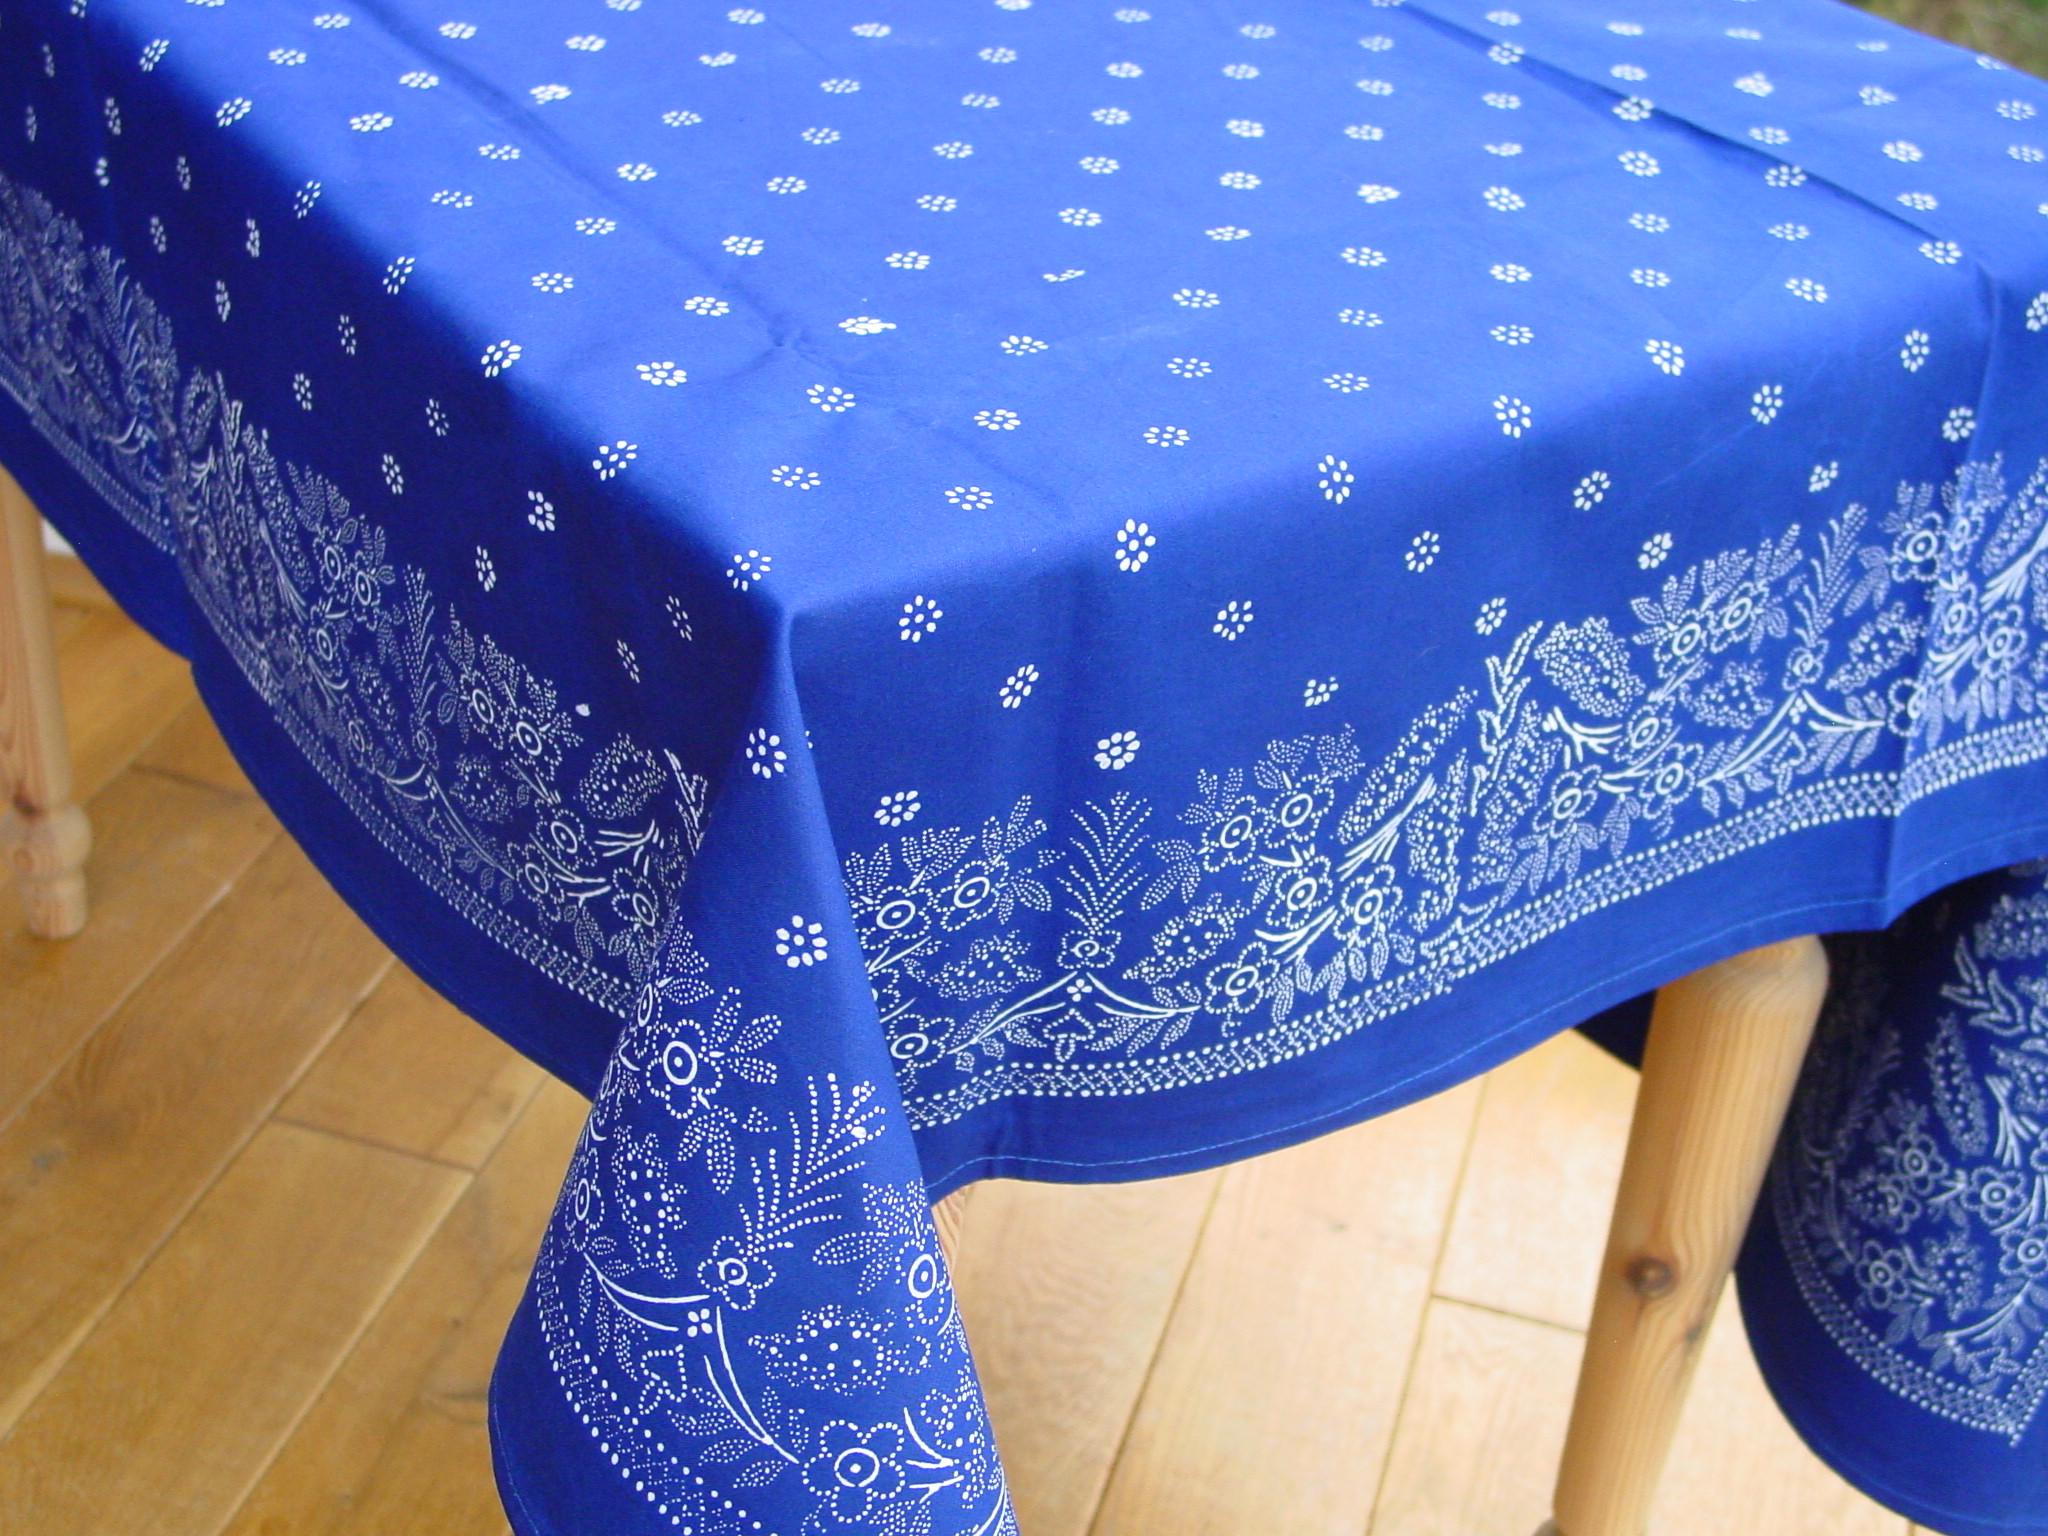 Große Blaudruck-Tischdecke 6487-0